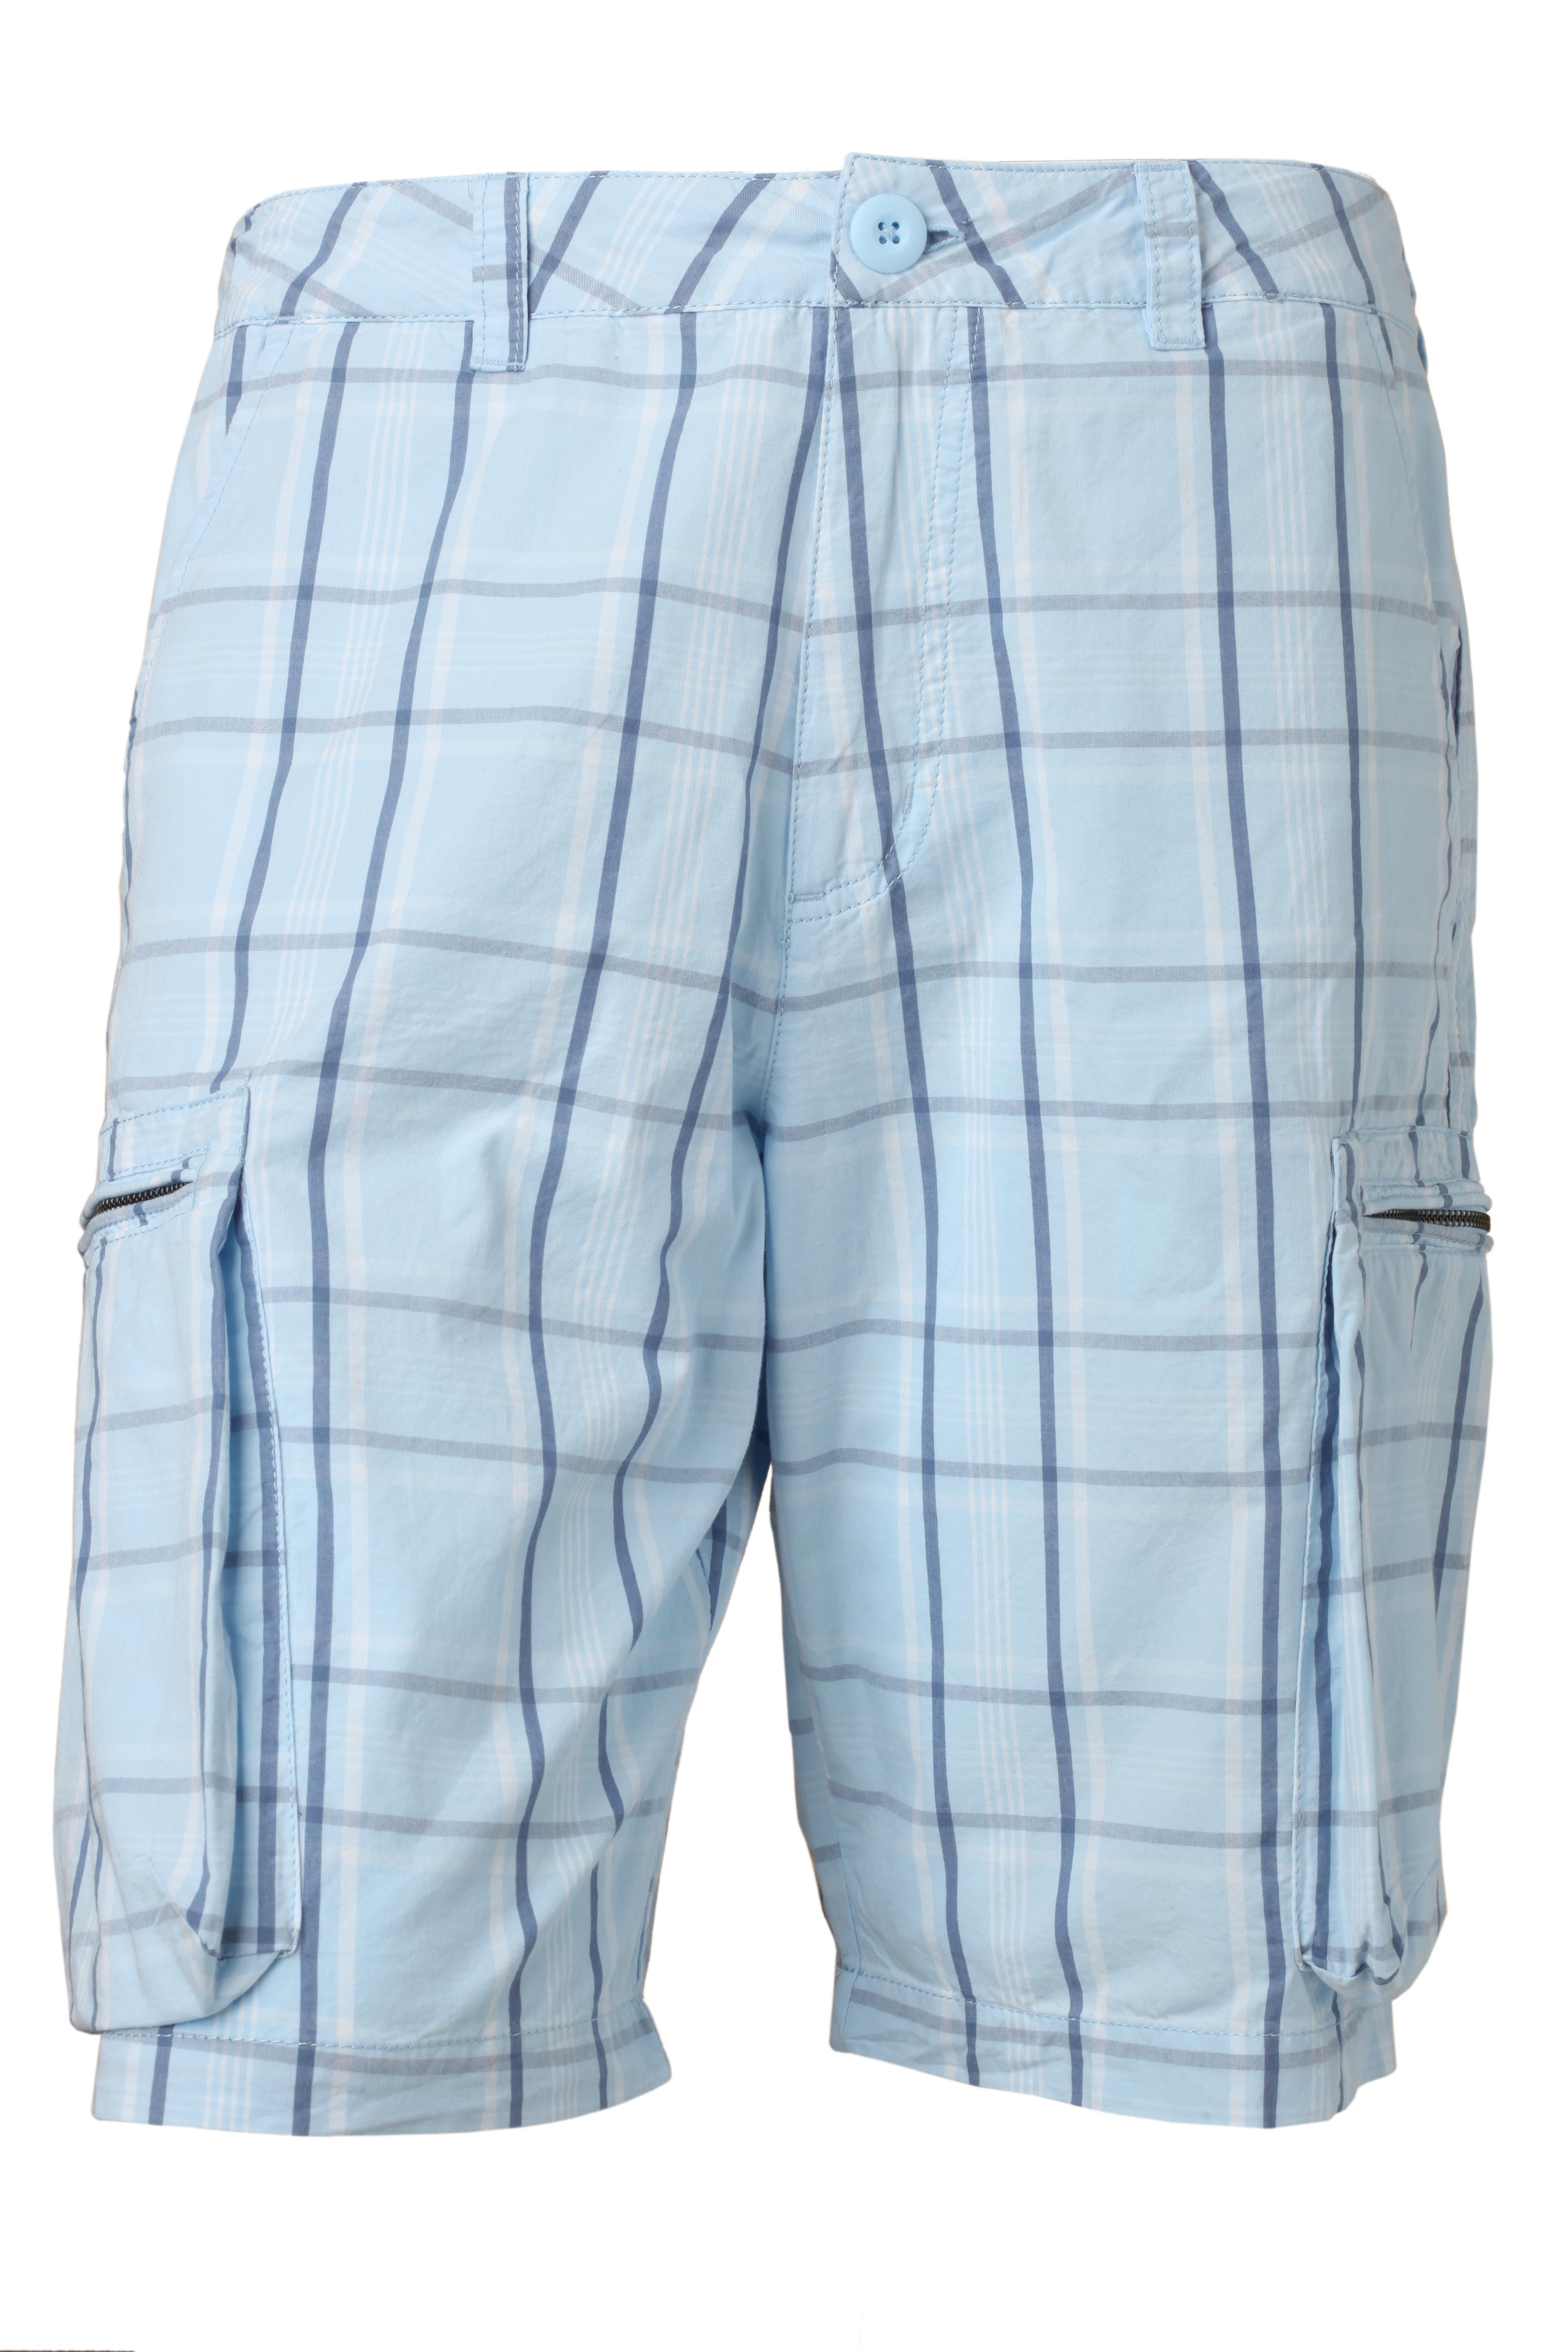 Мужские шорты Nike Challange Plaid Cargo Short, Цвет-Голубой, Размер-M